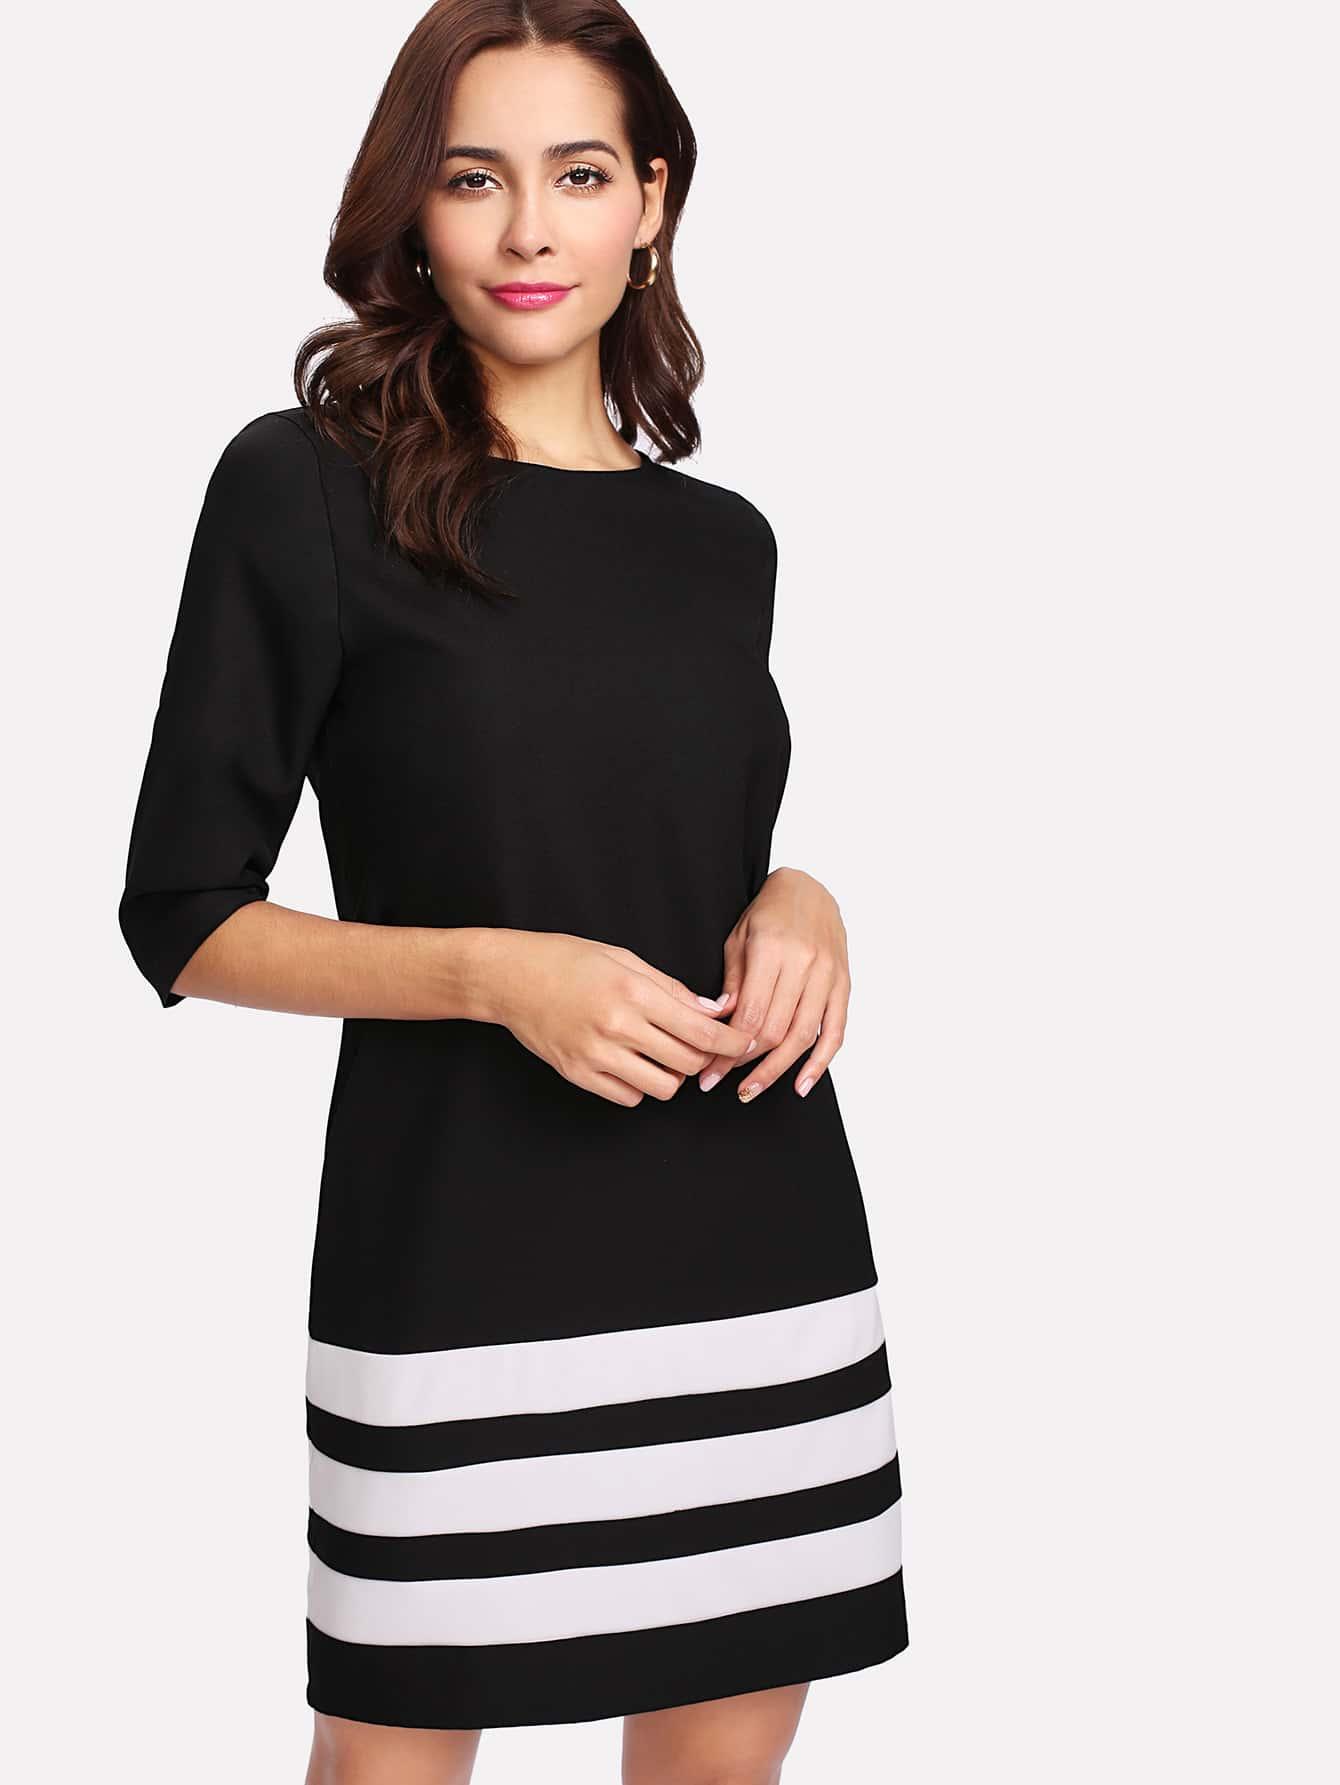 Contrast Striped Keyhole Back Dress contrast vertical stripe sleeveless keyhole back jumpsuit